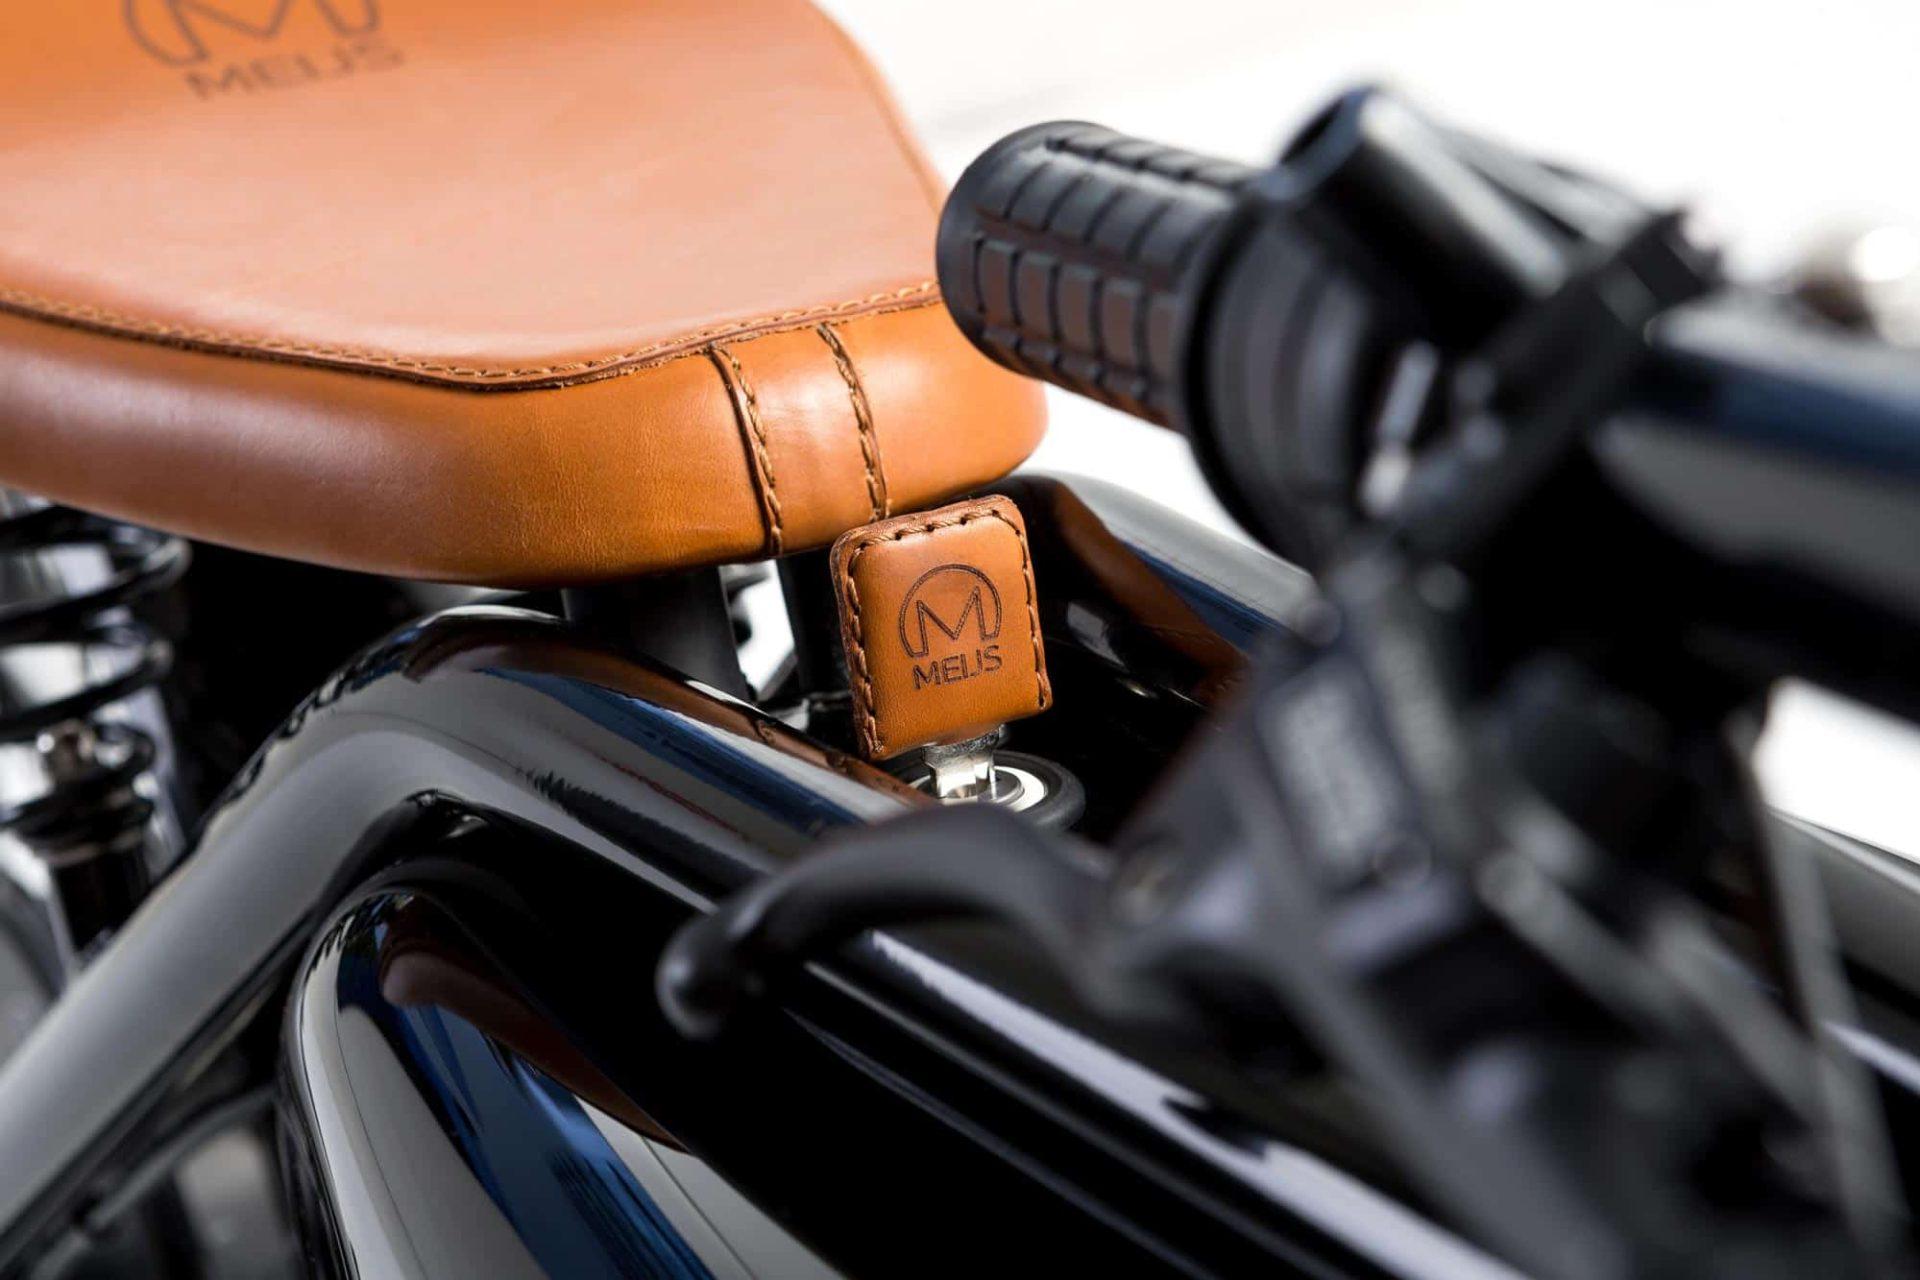 Meijs Motorman saddle and key - Rene Verkaart)